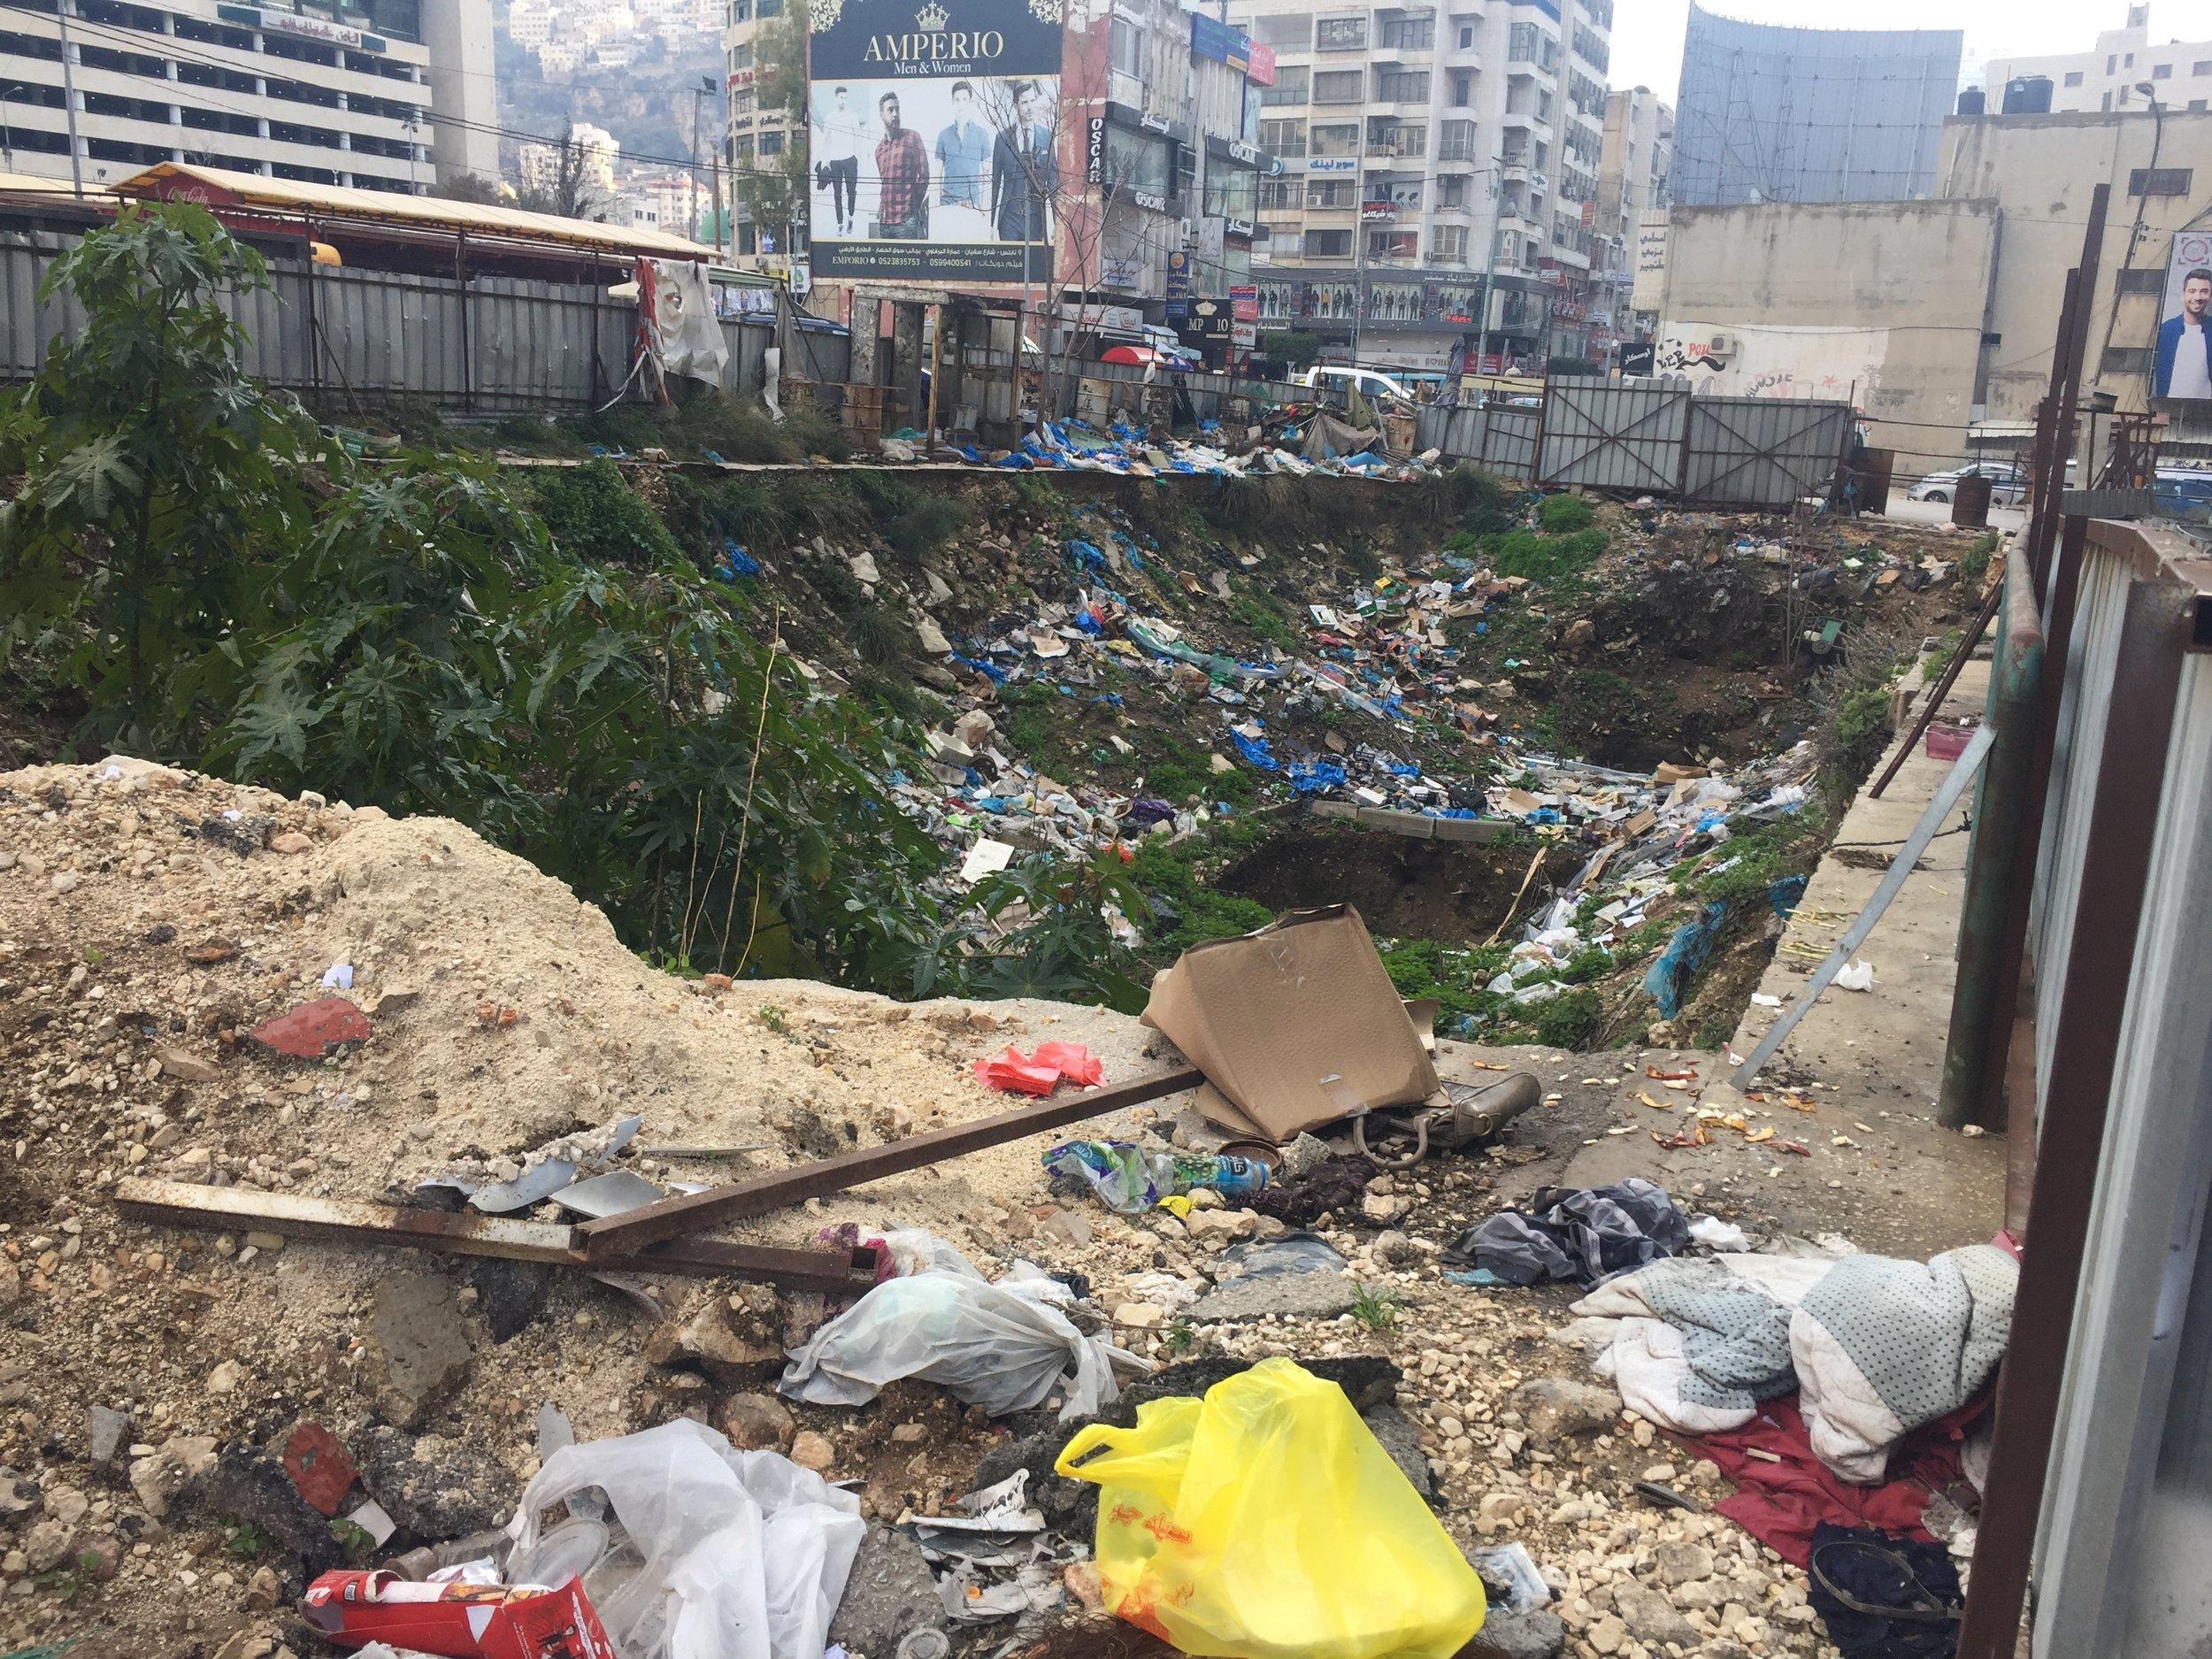 Try Wonder Erasmus Exchange Israel - Nablus in 10 Images 9 - dumping ground for trash